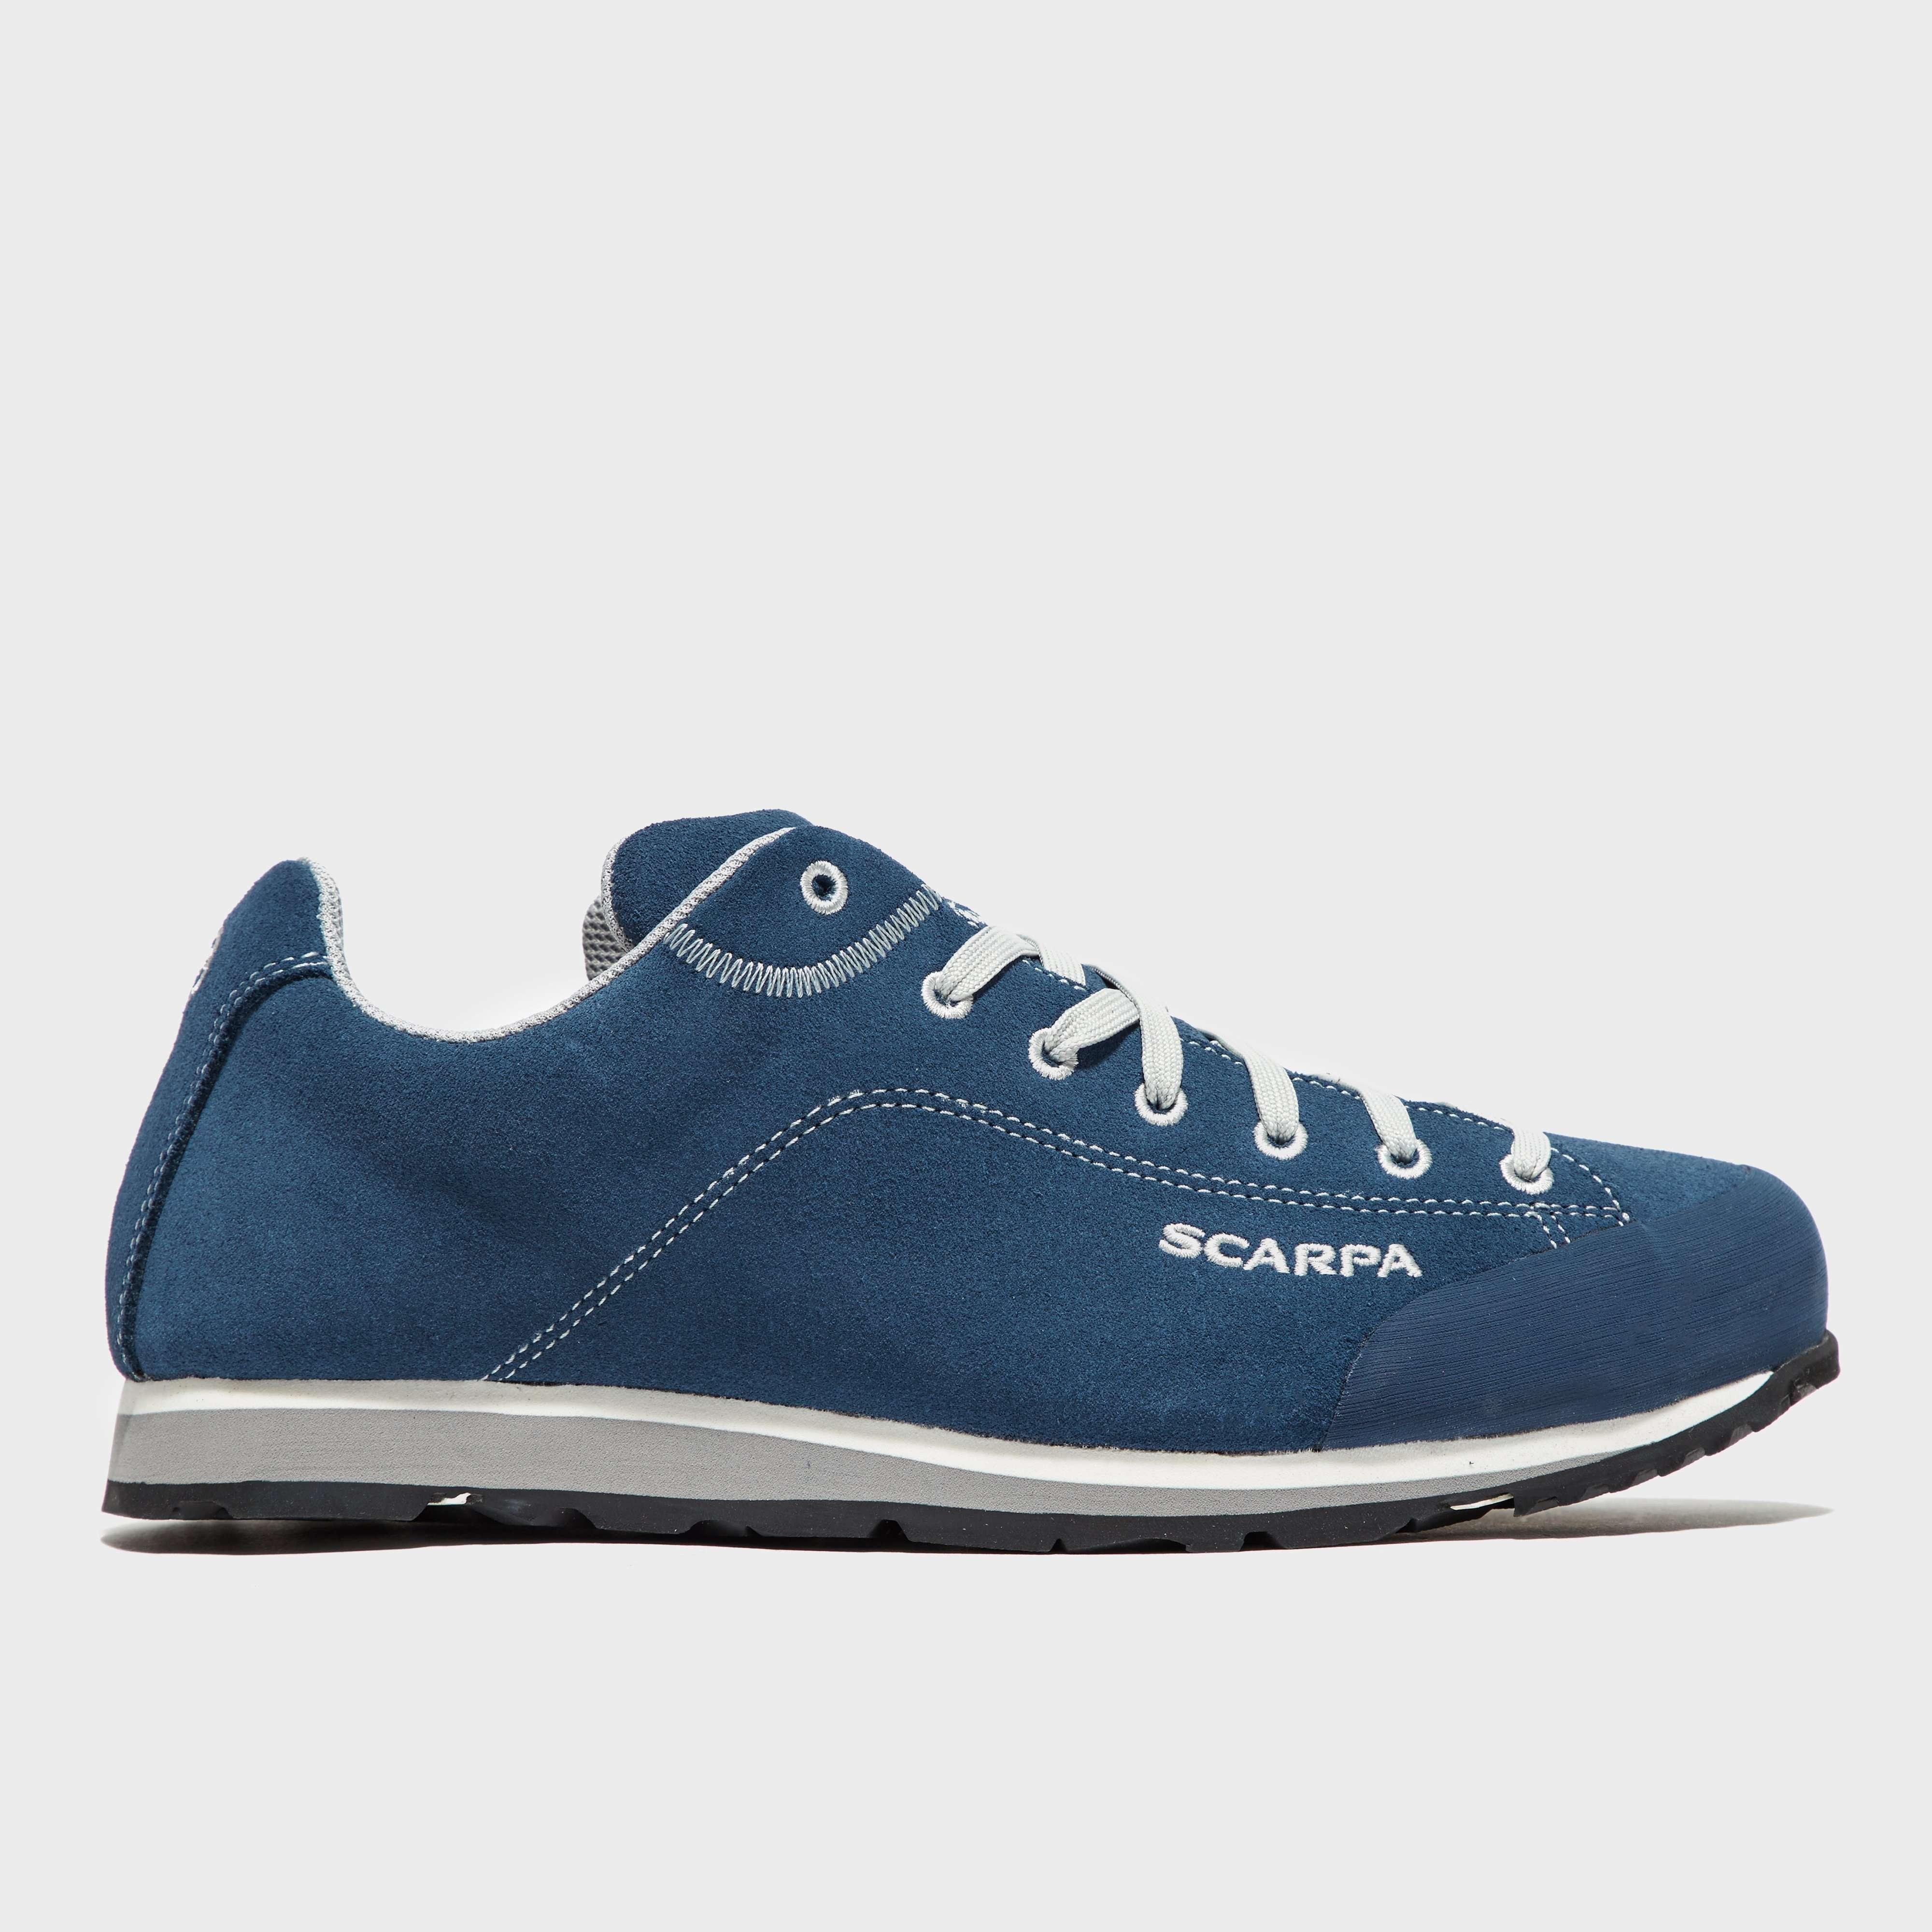 SCARPA Men's Margarita Shoes